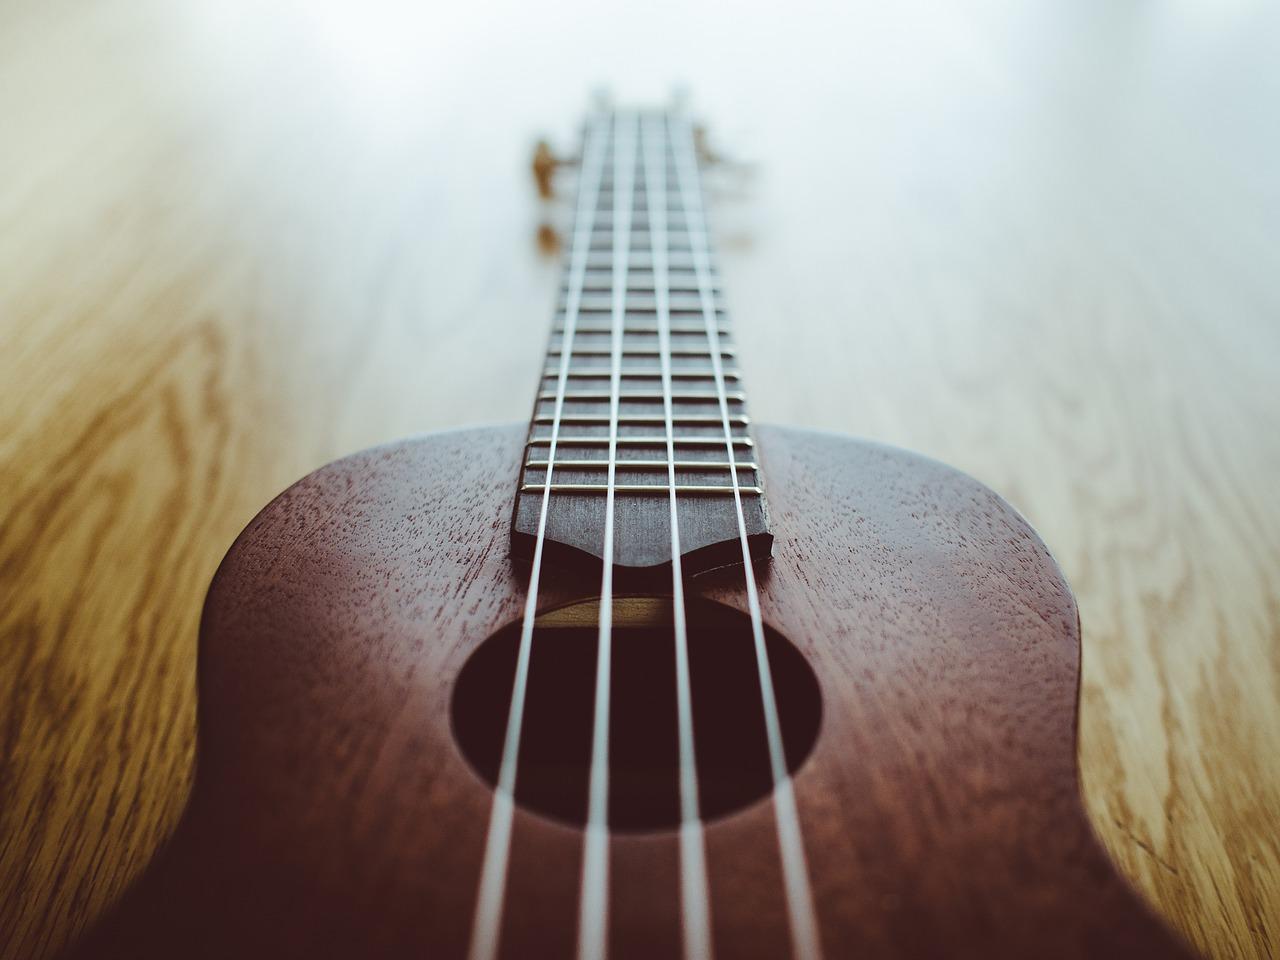 Find The Best Ukulele Strings For Your Uke!